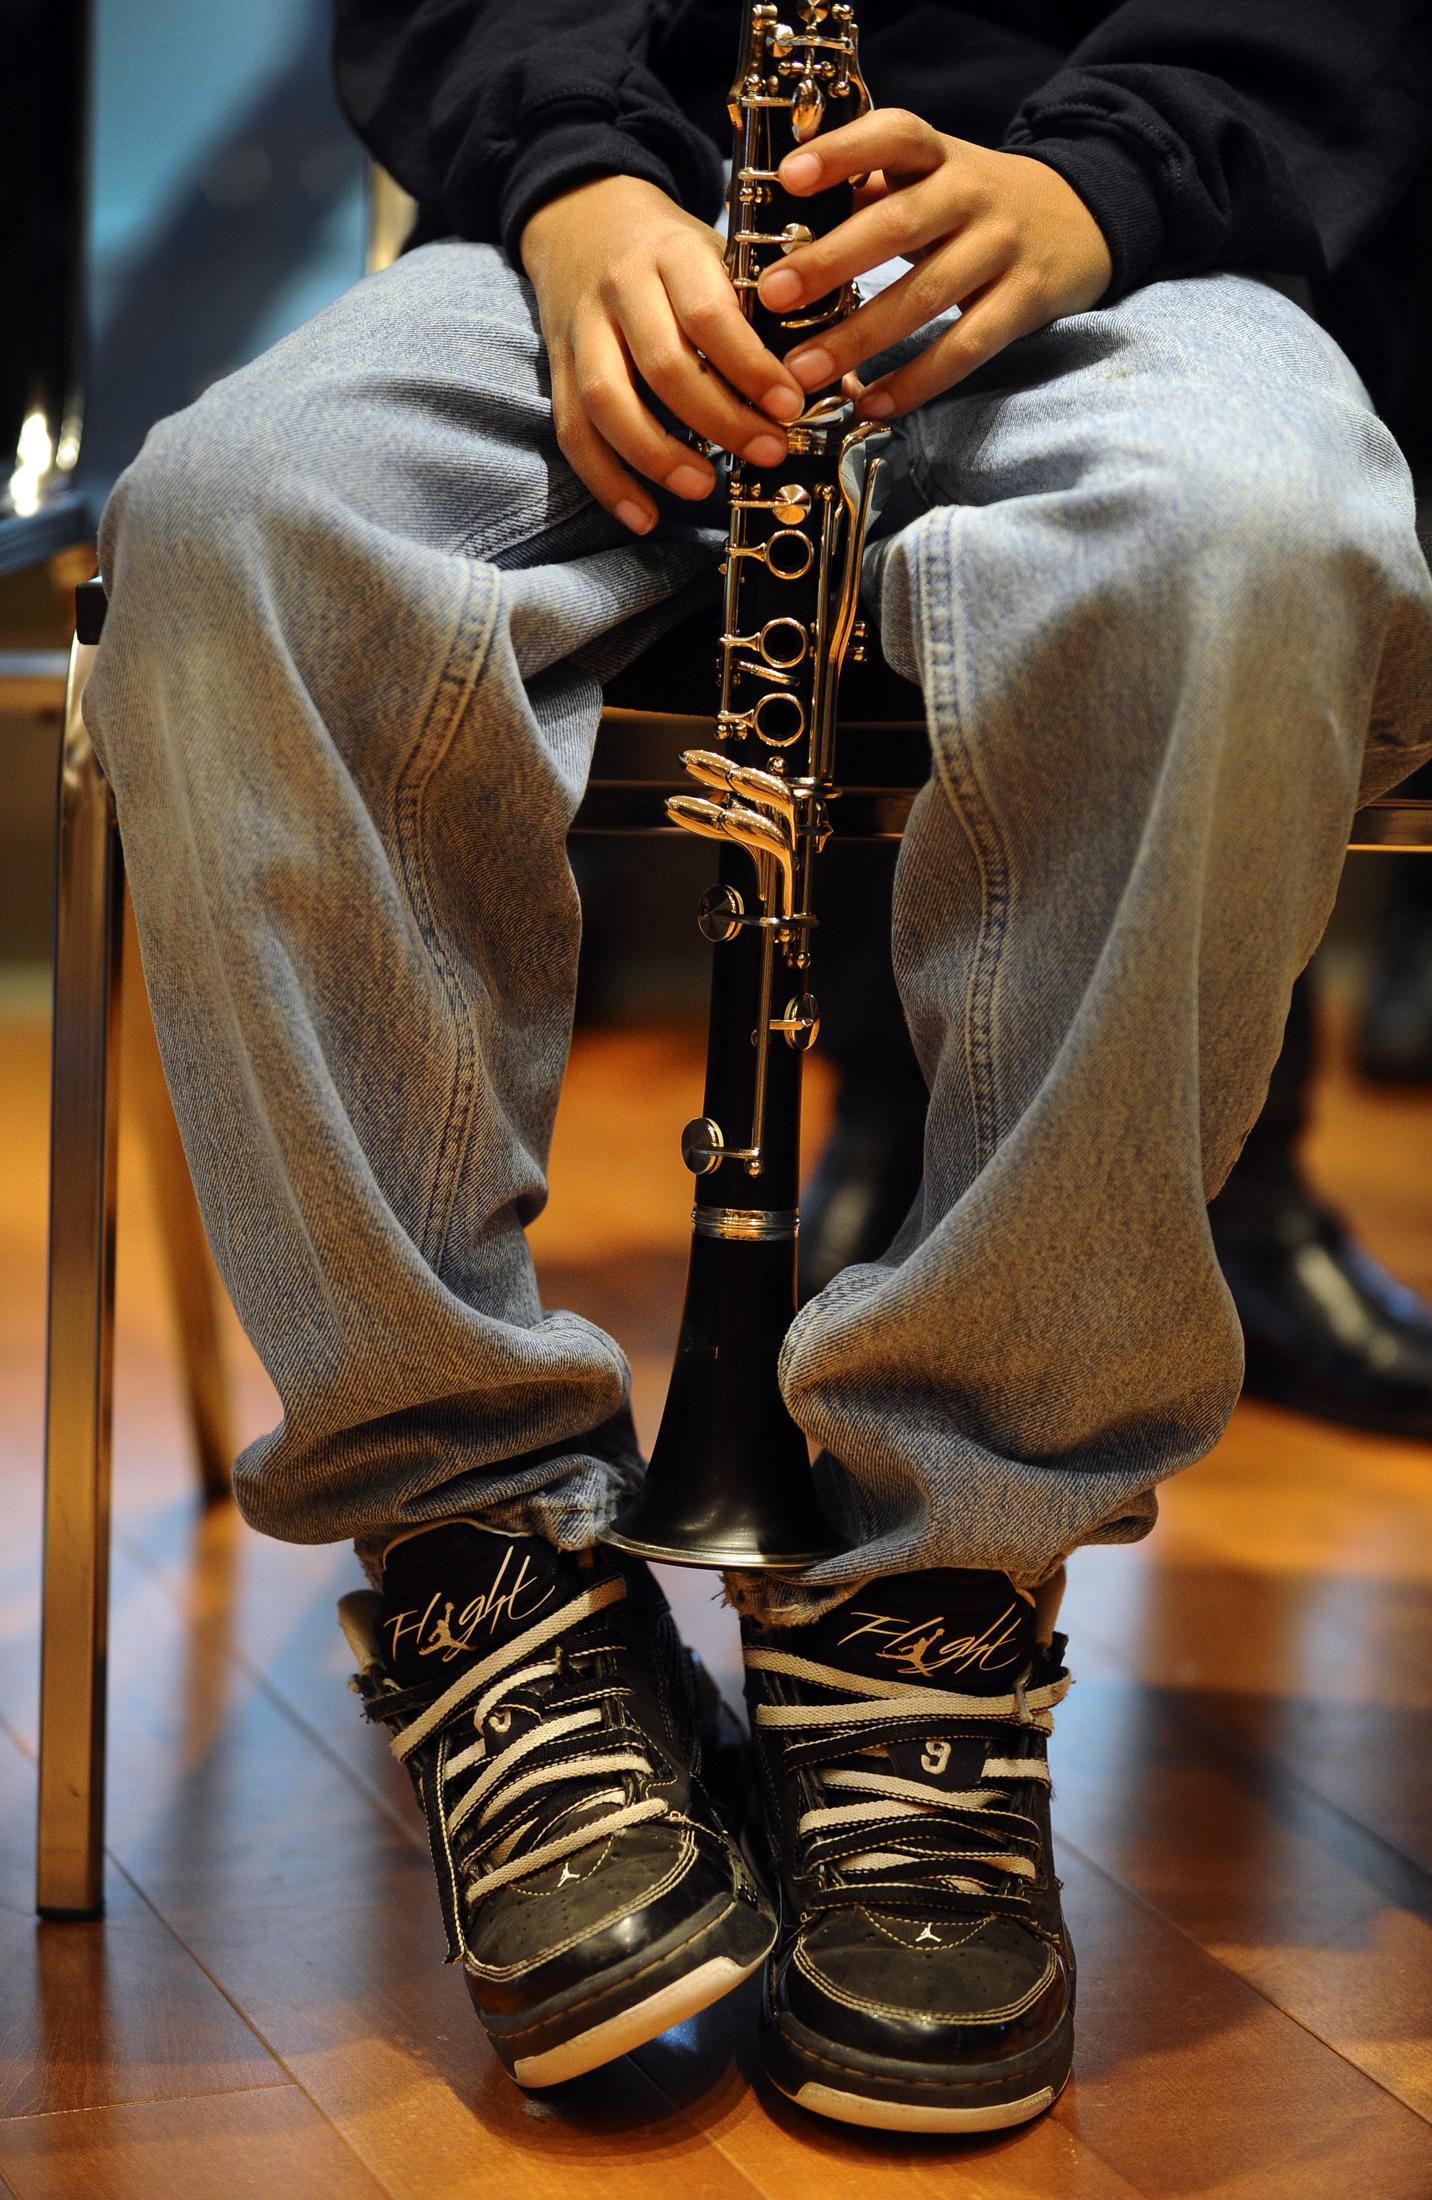 Stock Photo: Bringing Music To Life Instrument Drive - clarinet